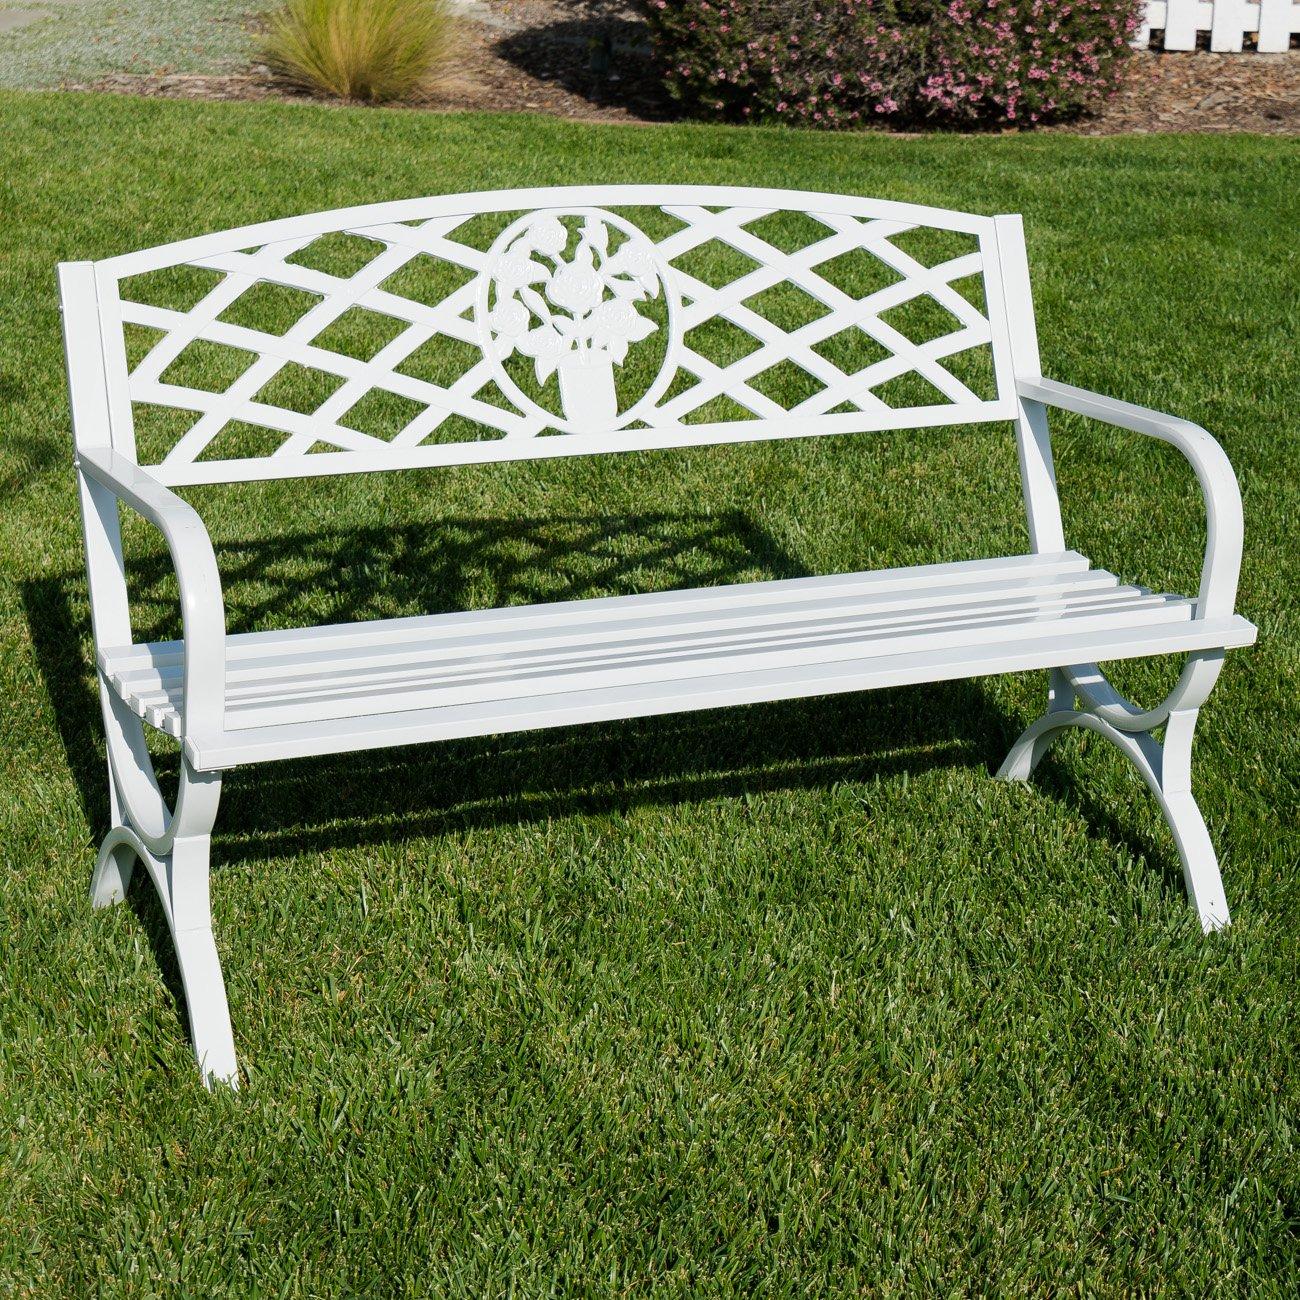 Belleze 50'' inch Outdoor Park Bench Garden Backyard Furniture Chair Porch Seat Steel Frame, White by Belleze